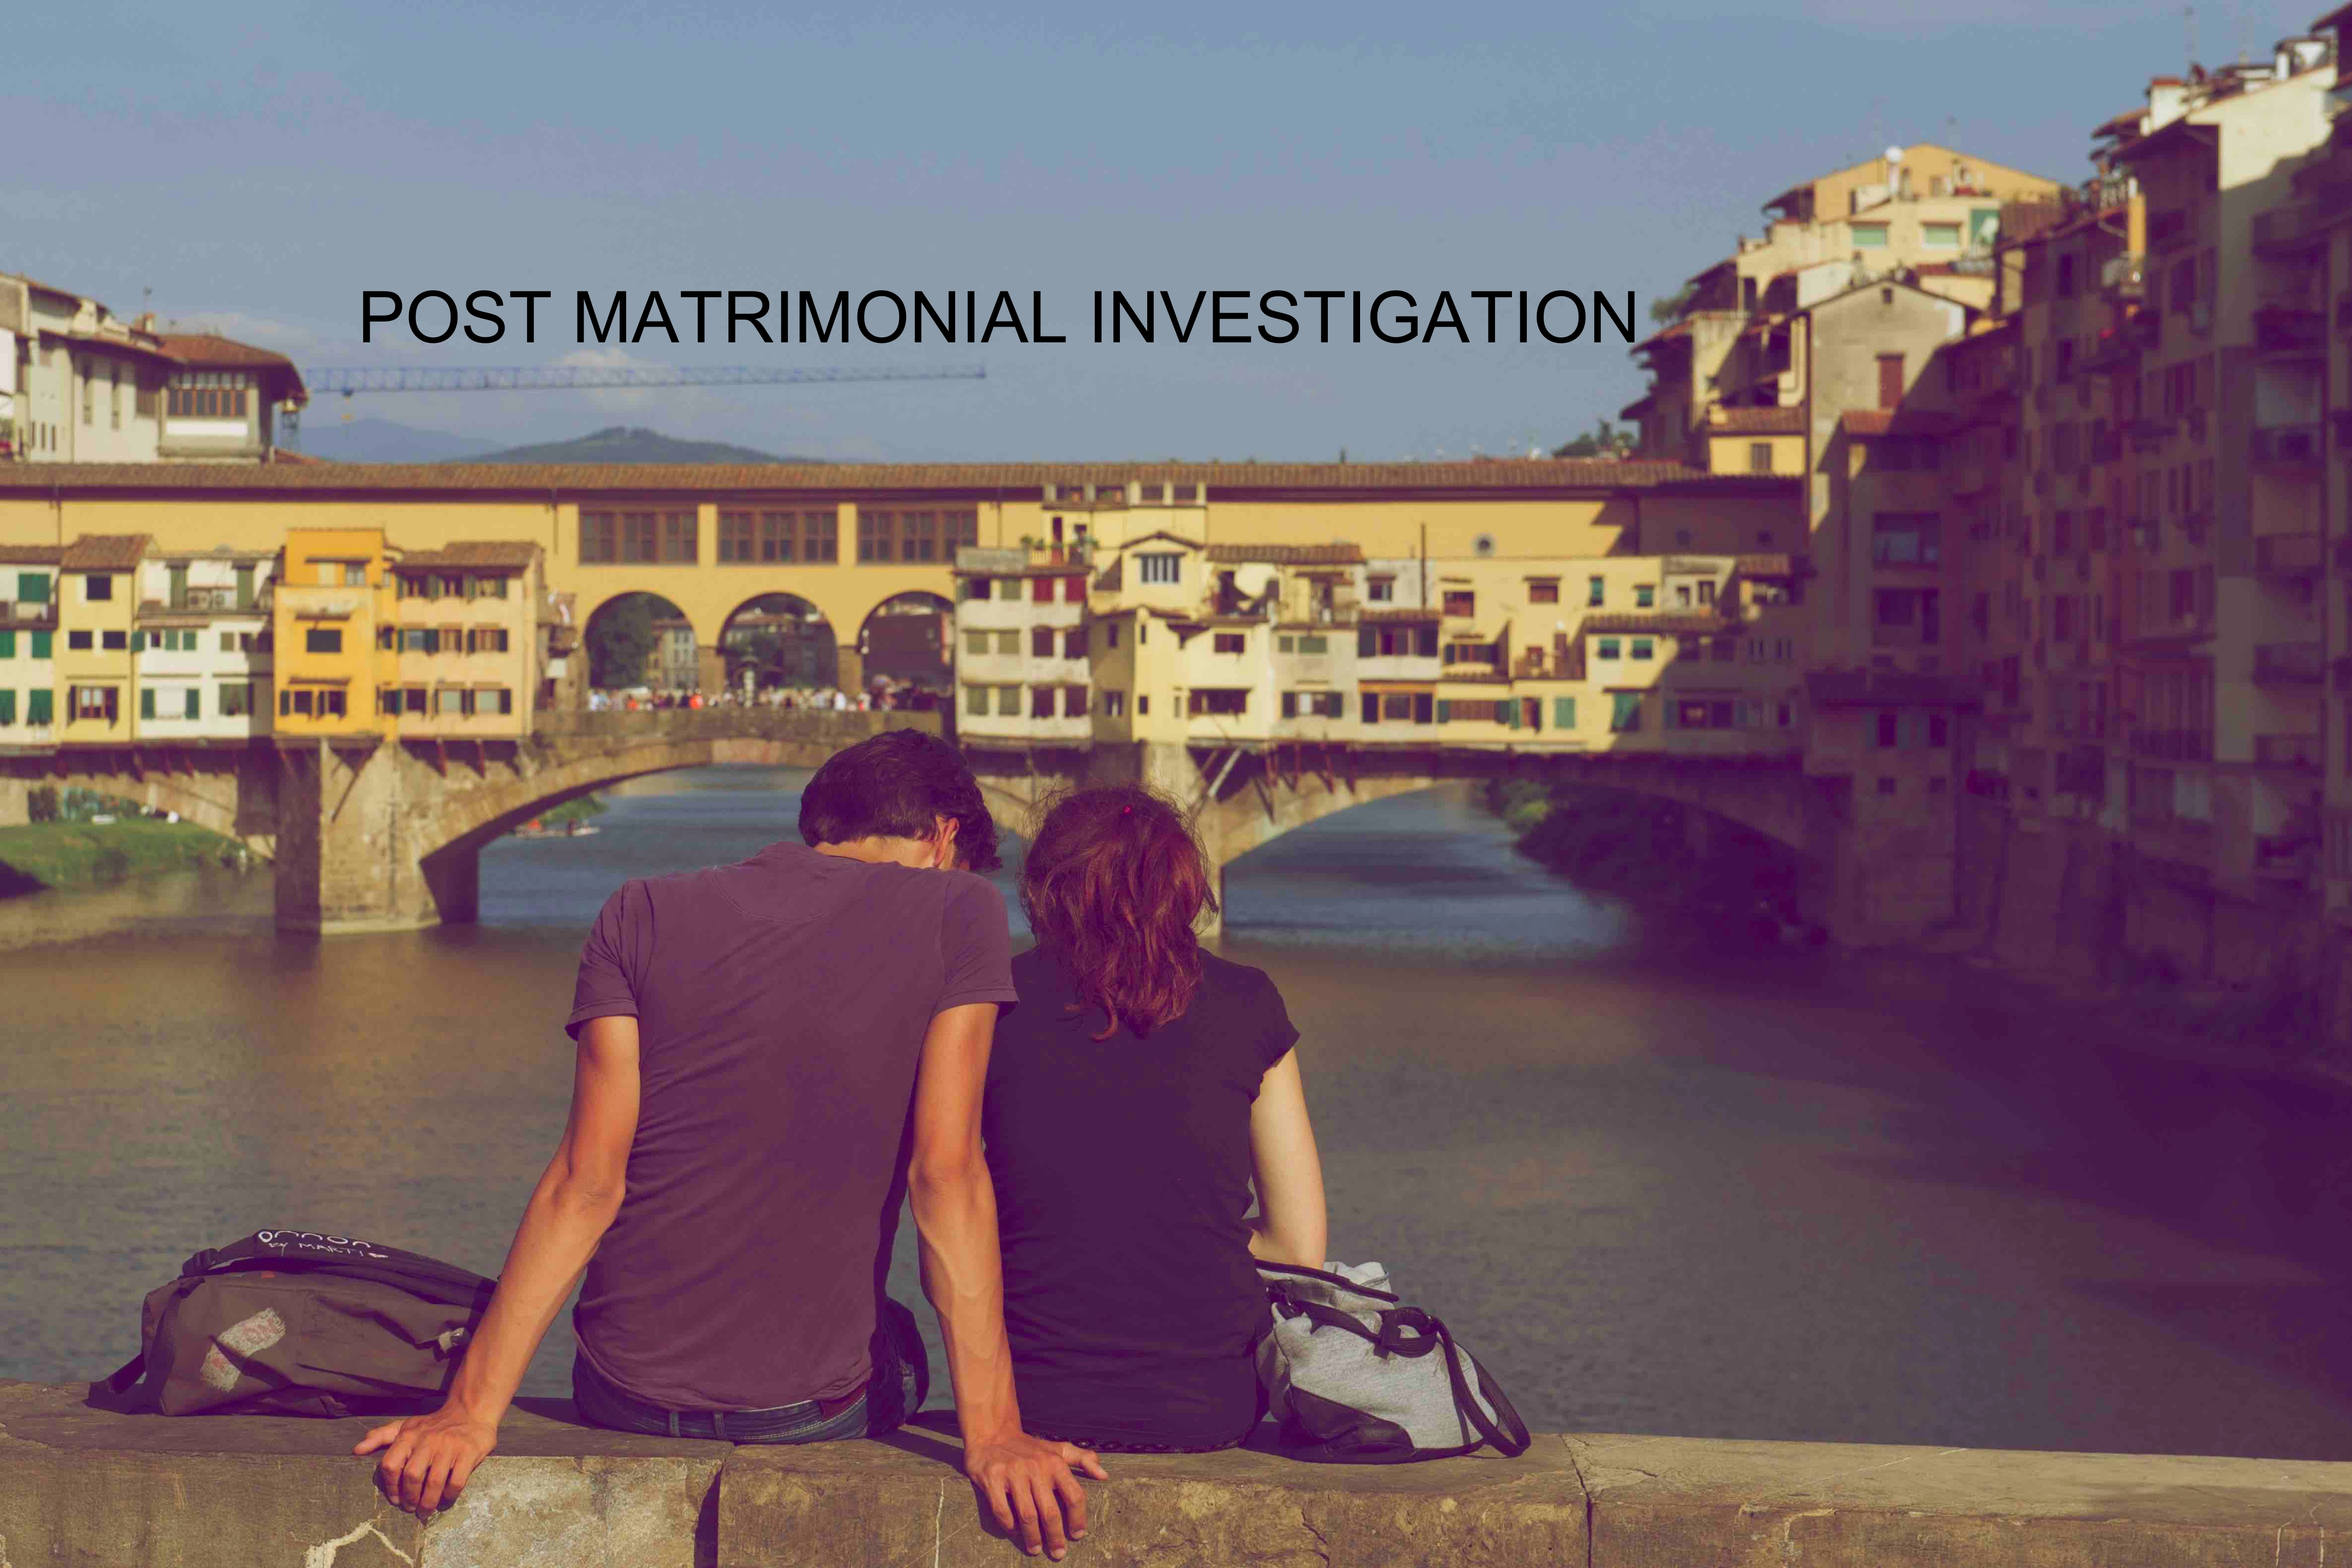 post matrimonial investigation